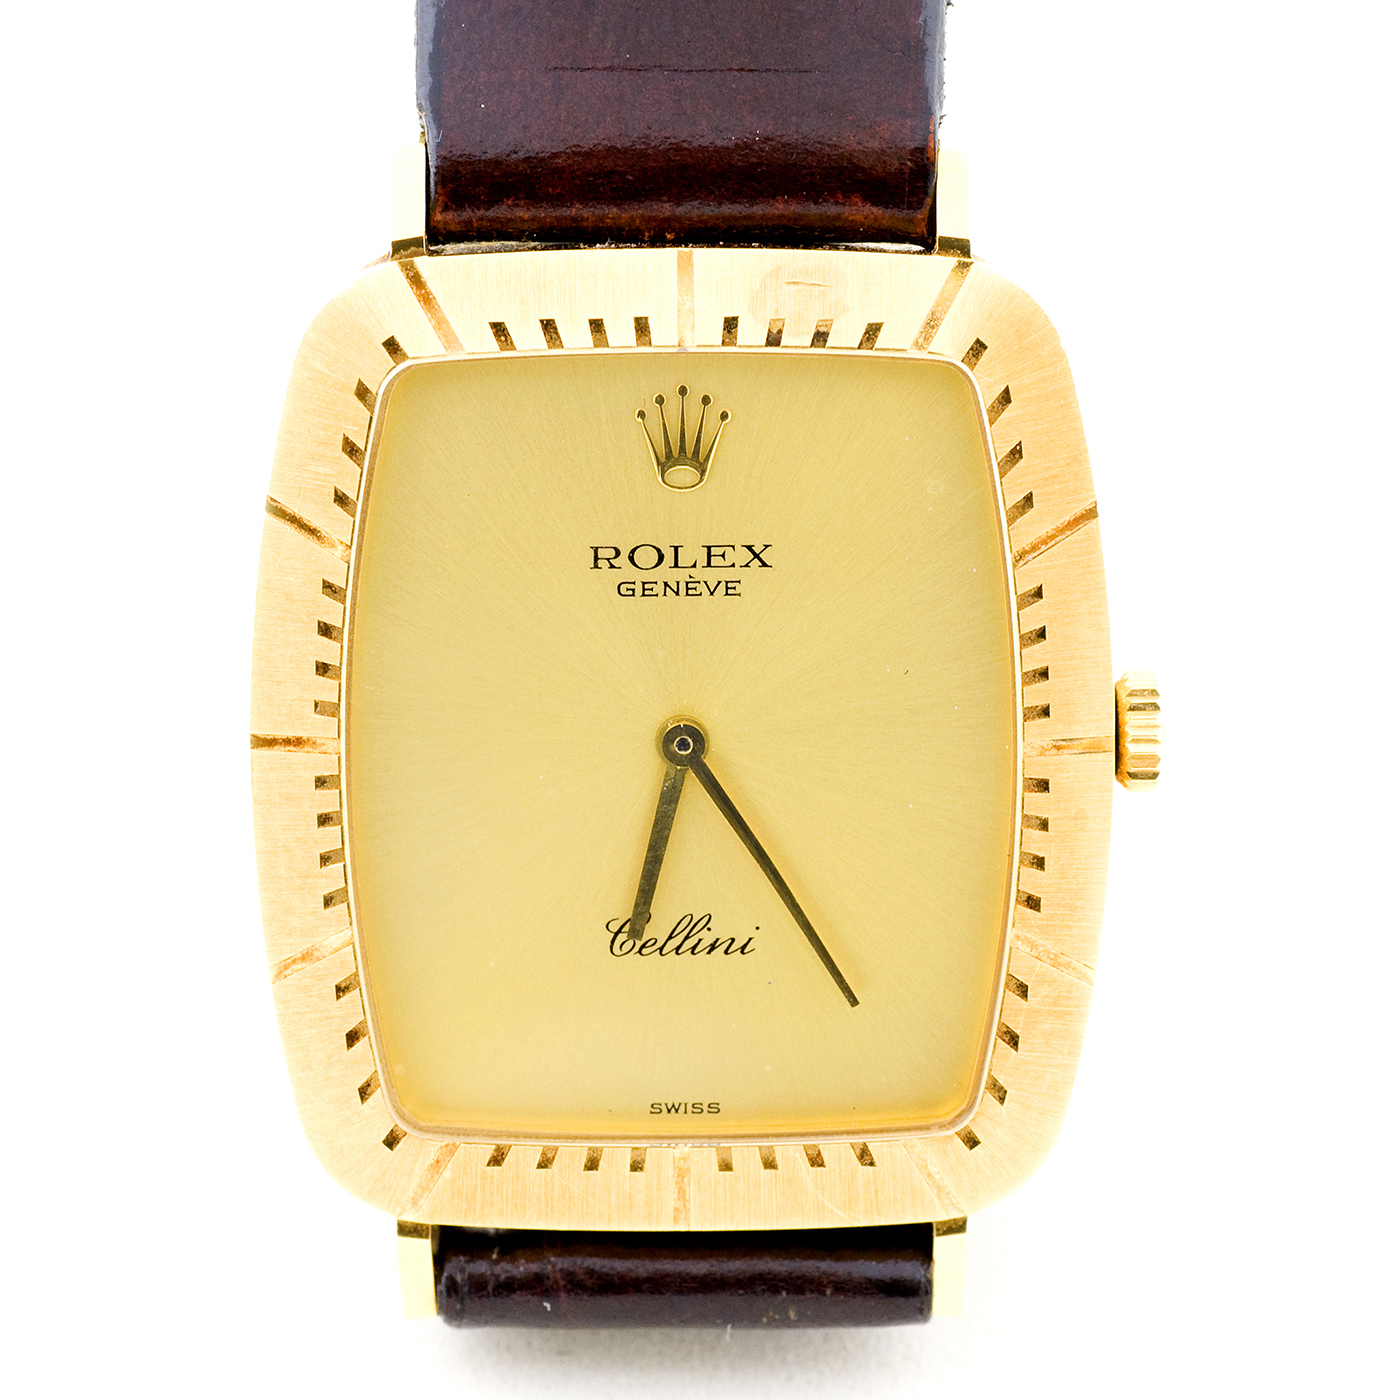 Rolex Cellini. Reloj de pulsera para hombre. Ca. 1980.